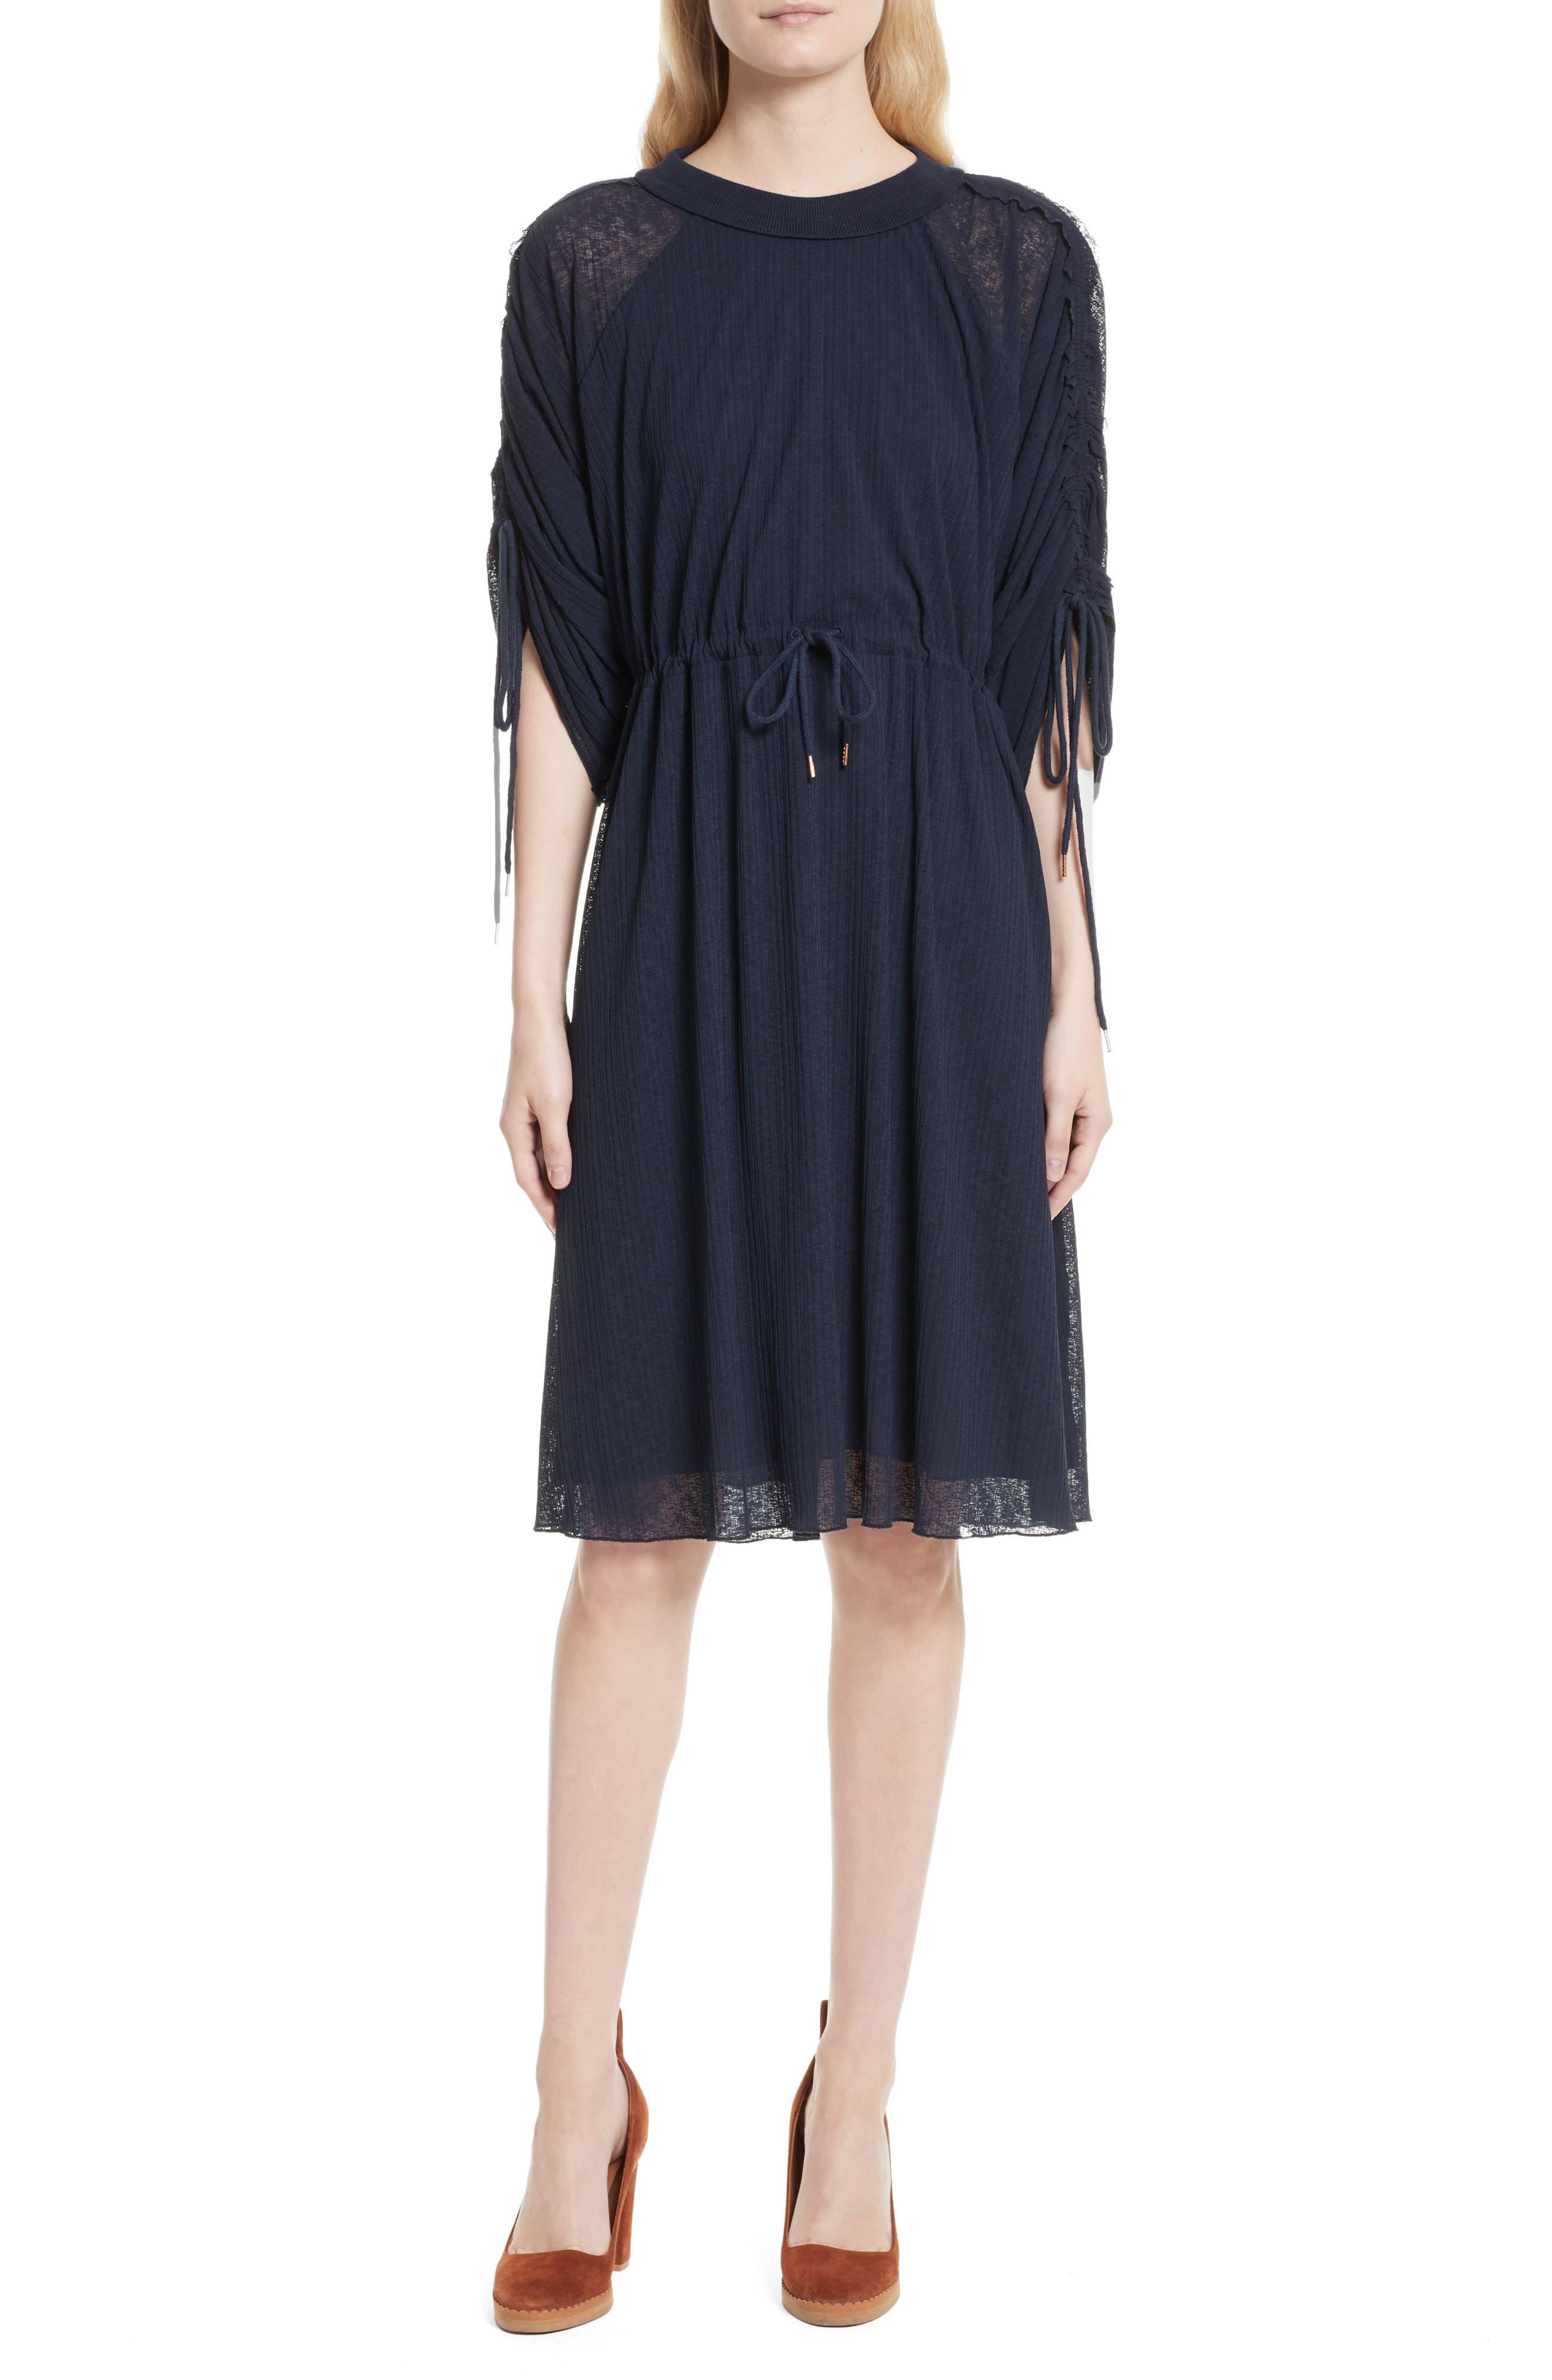 Main Image - See by Chloé Knit Raglan Dress